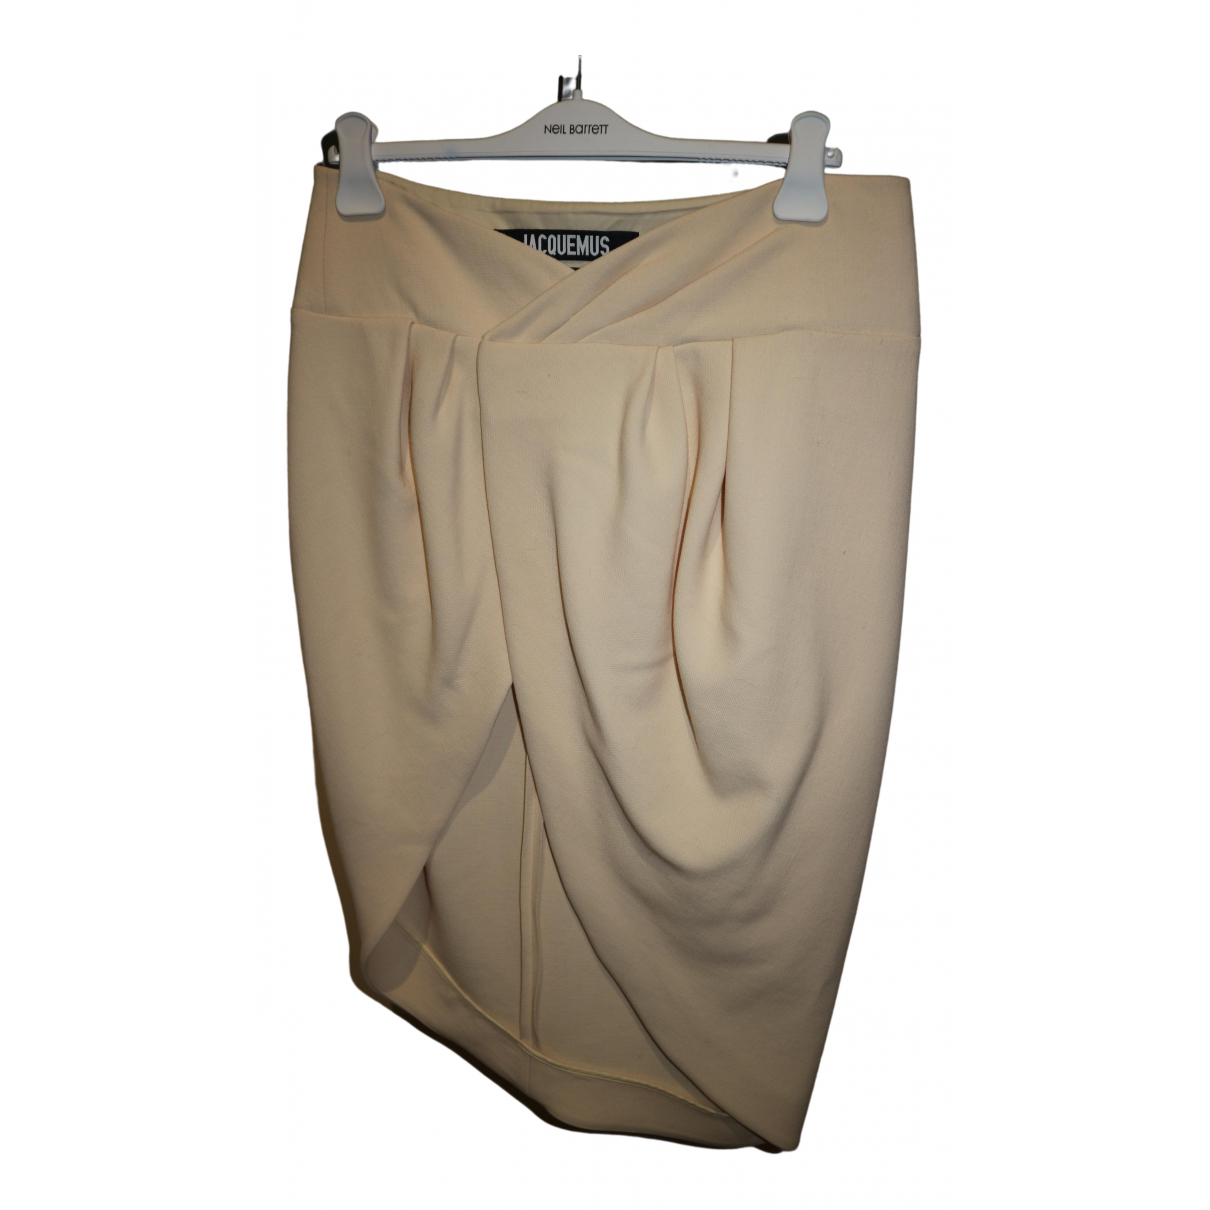 Jacquemus Le Souk Beige Wool skirt for Women 40 FR